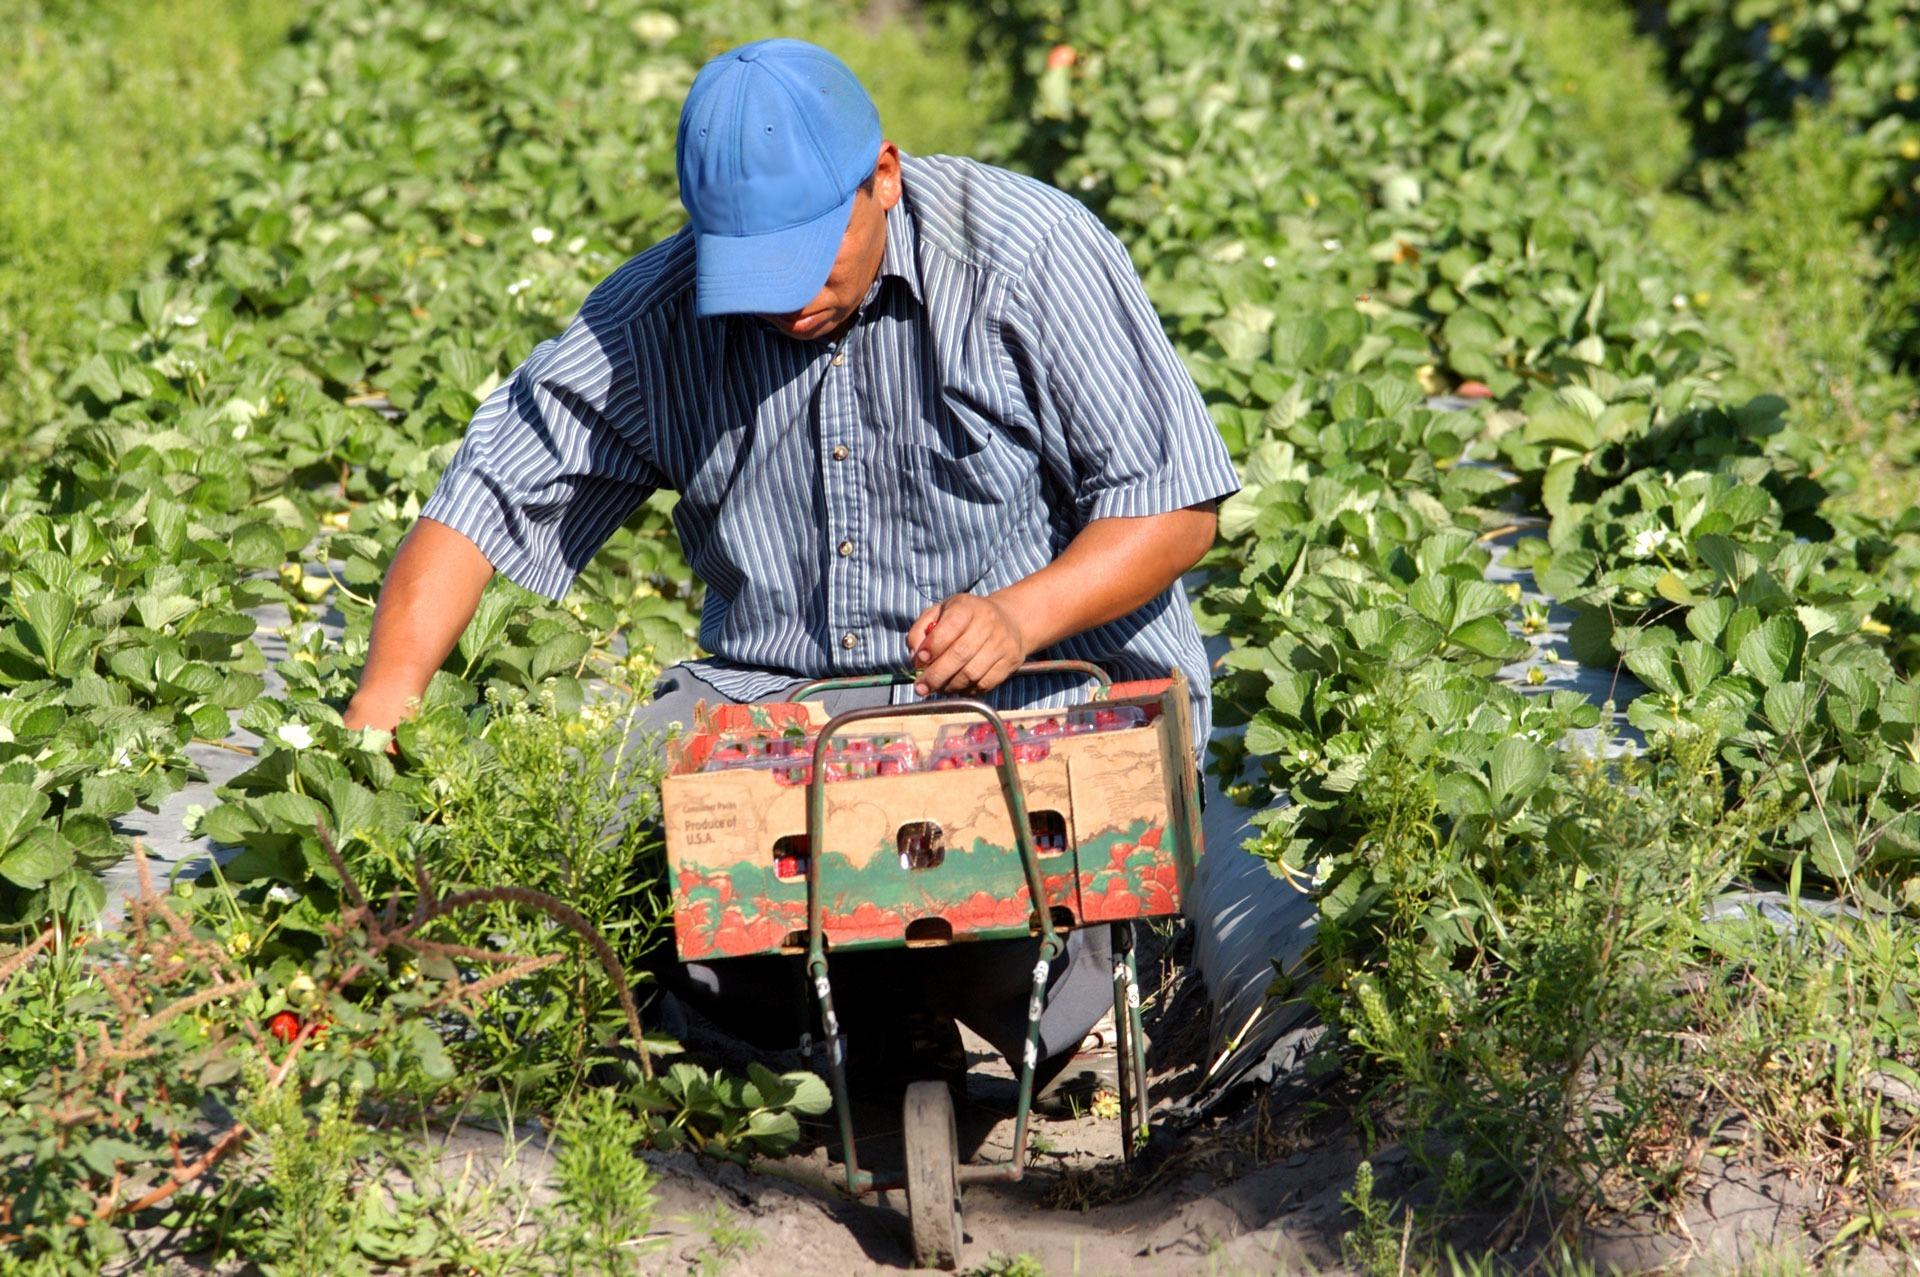 Worker picking strawberries